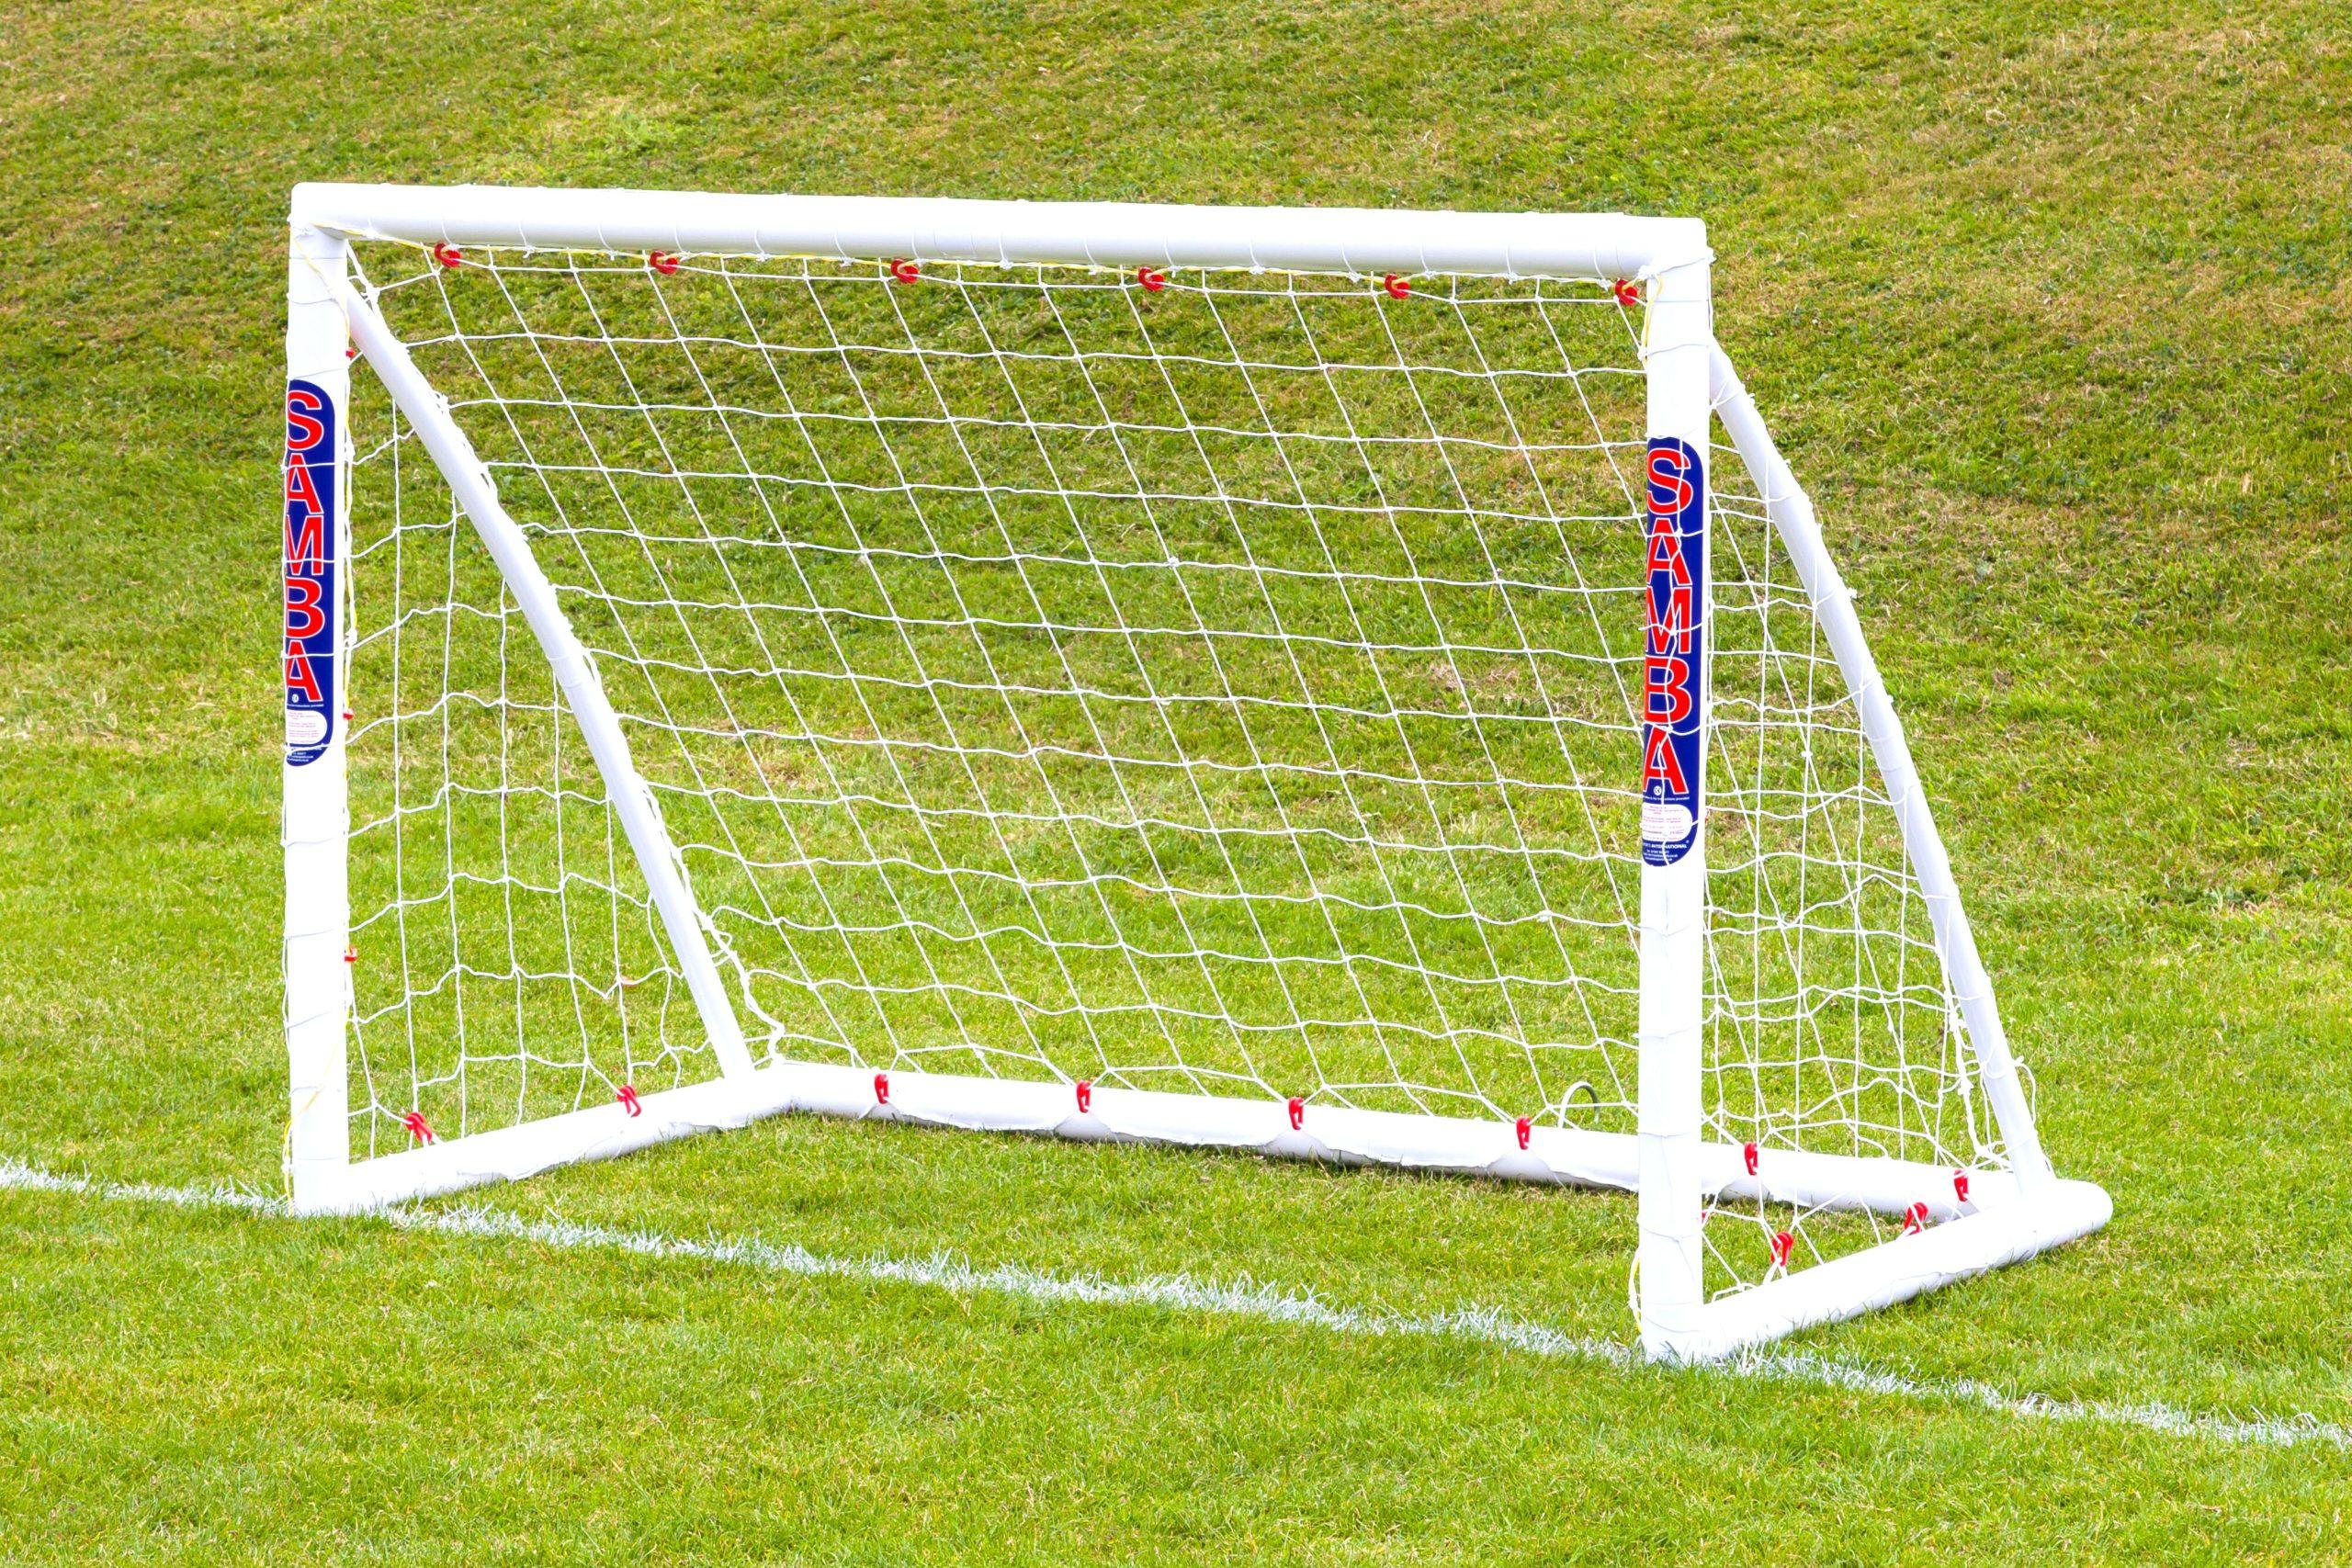 Trainer Goal 6' x 4'